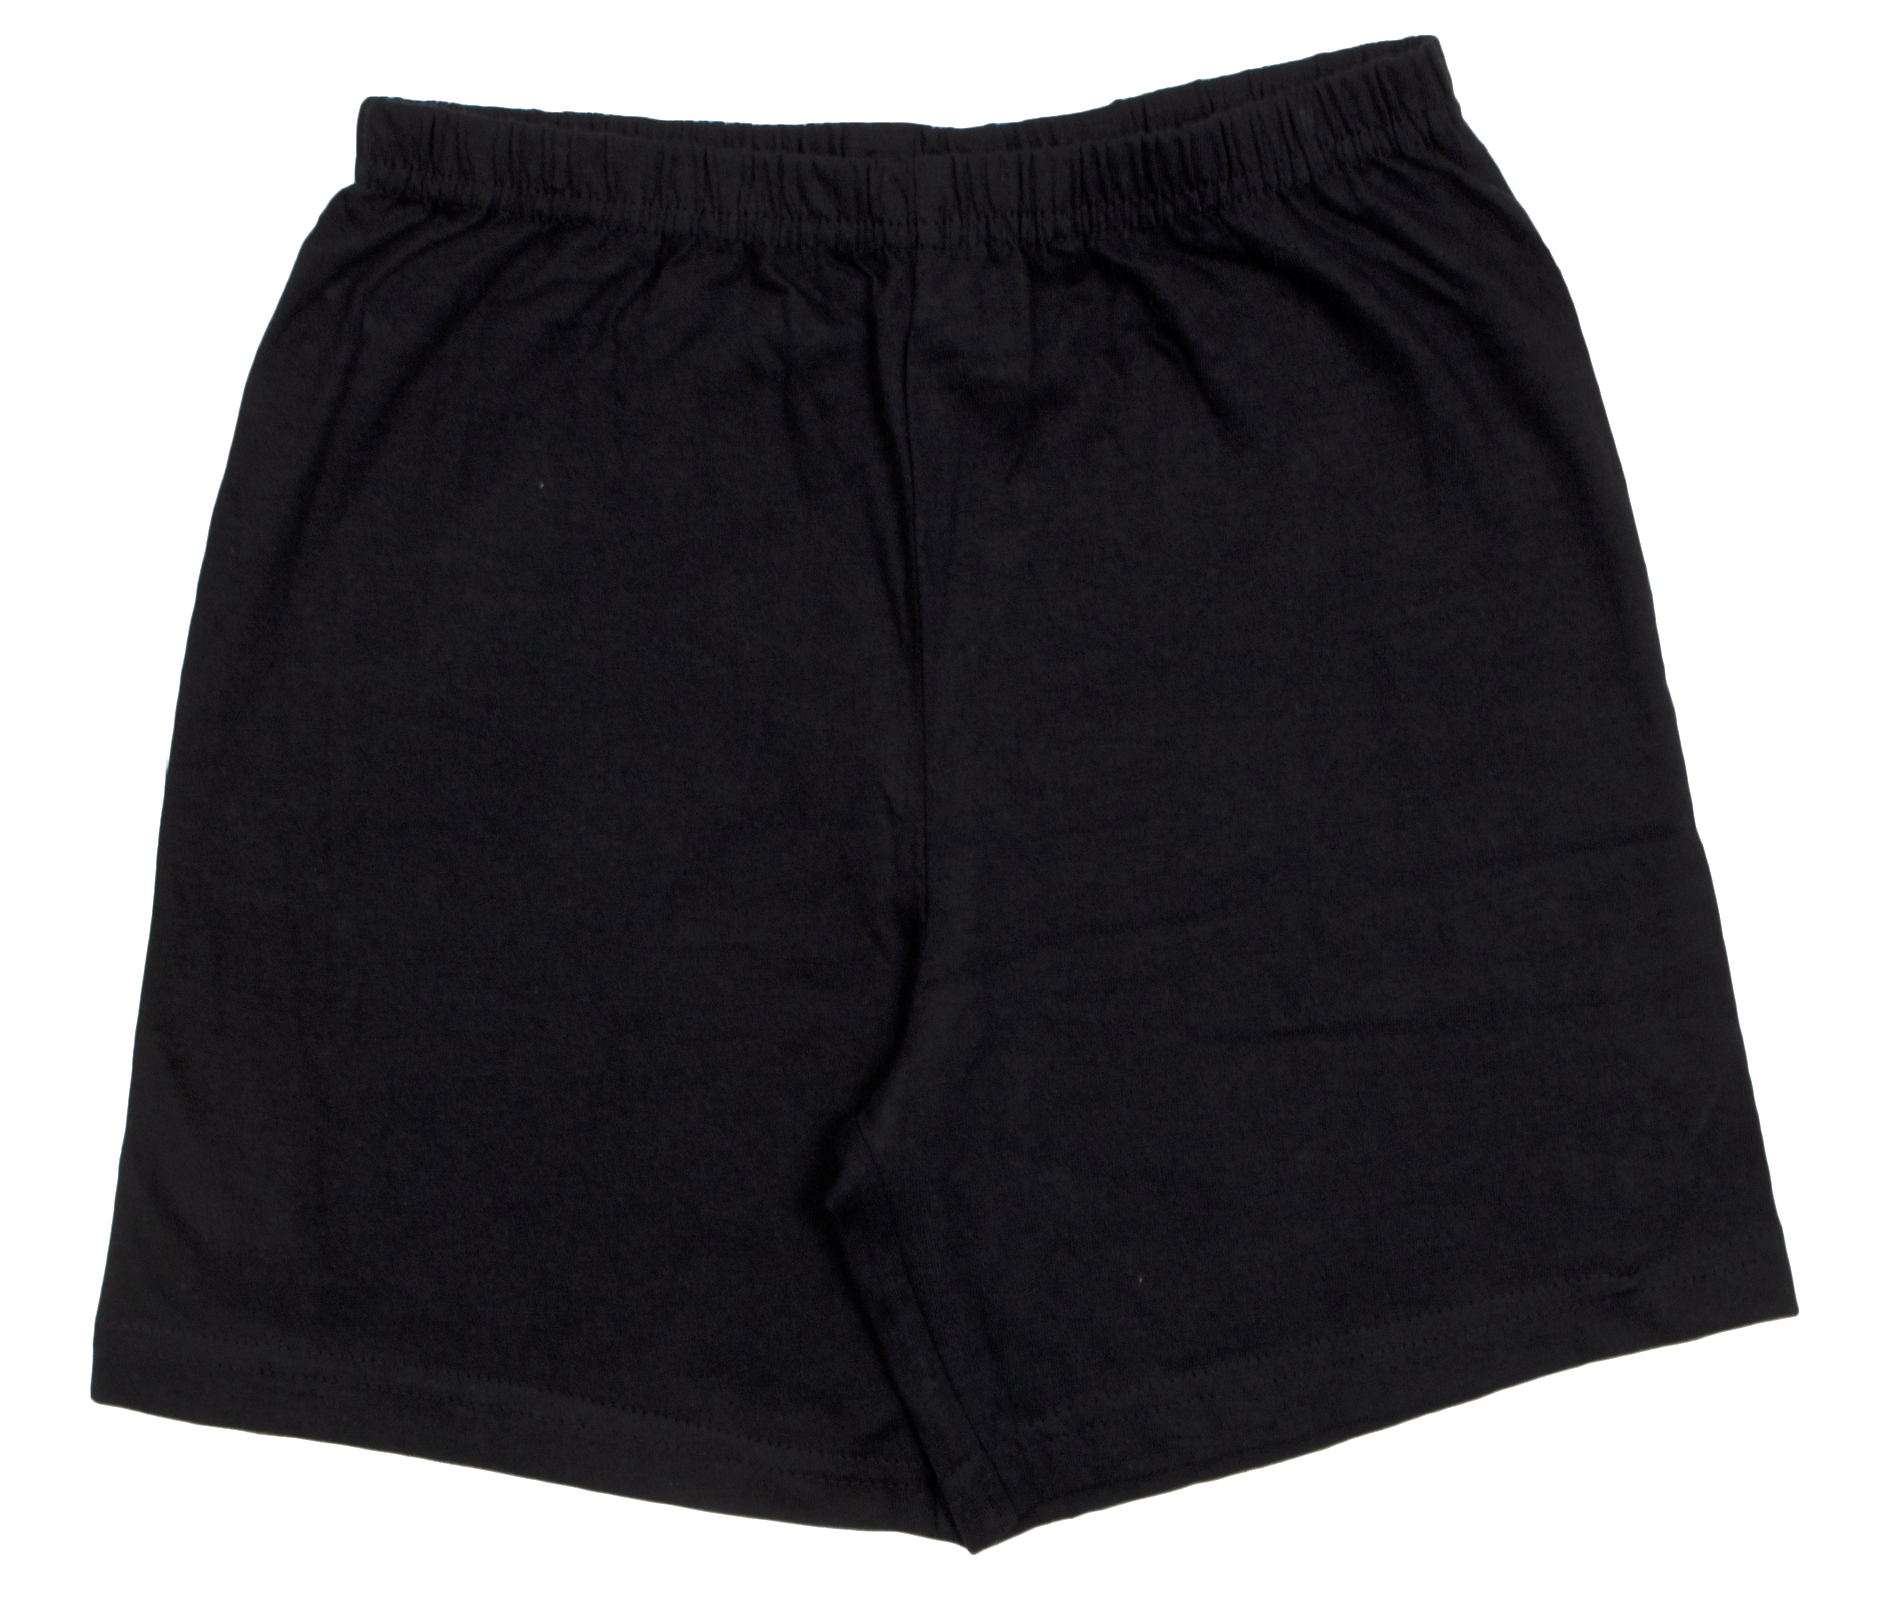 f5462405bbf9 Boys Girls Pokemon Short Pyjamas Short Sleeve Shortie PJs Set ...